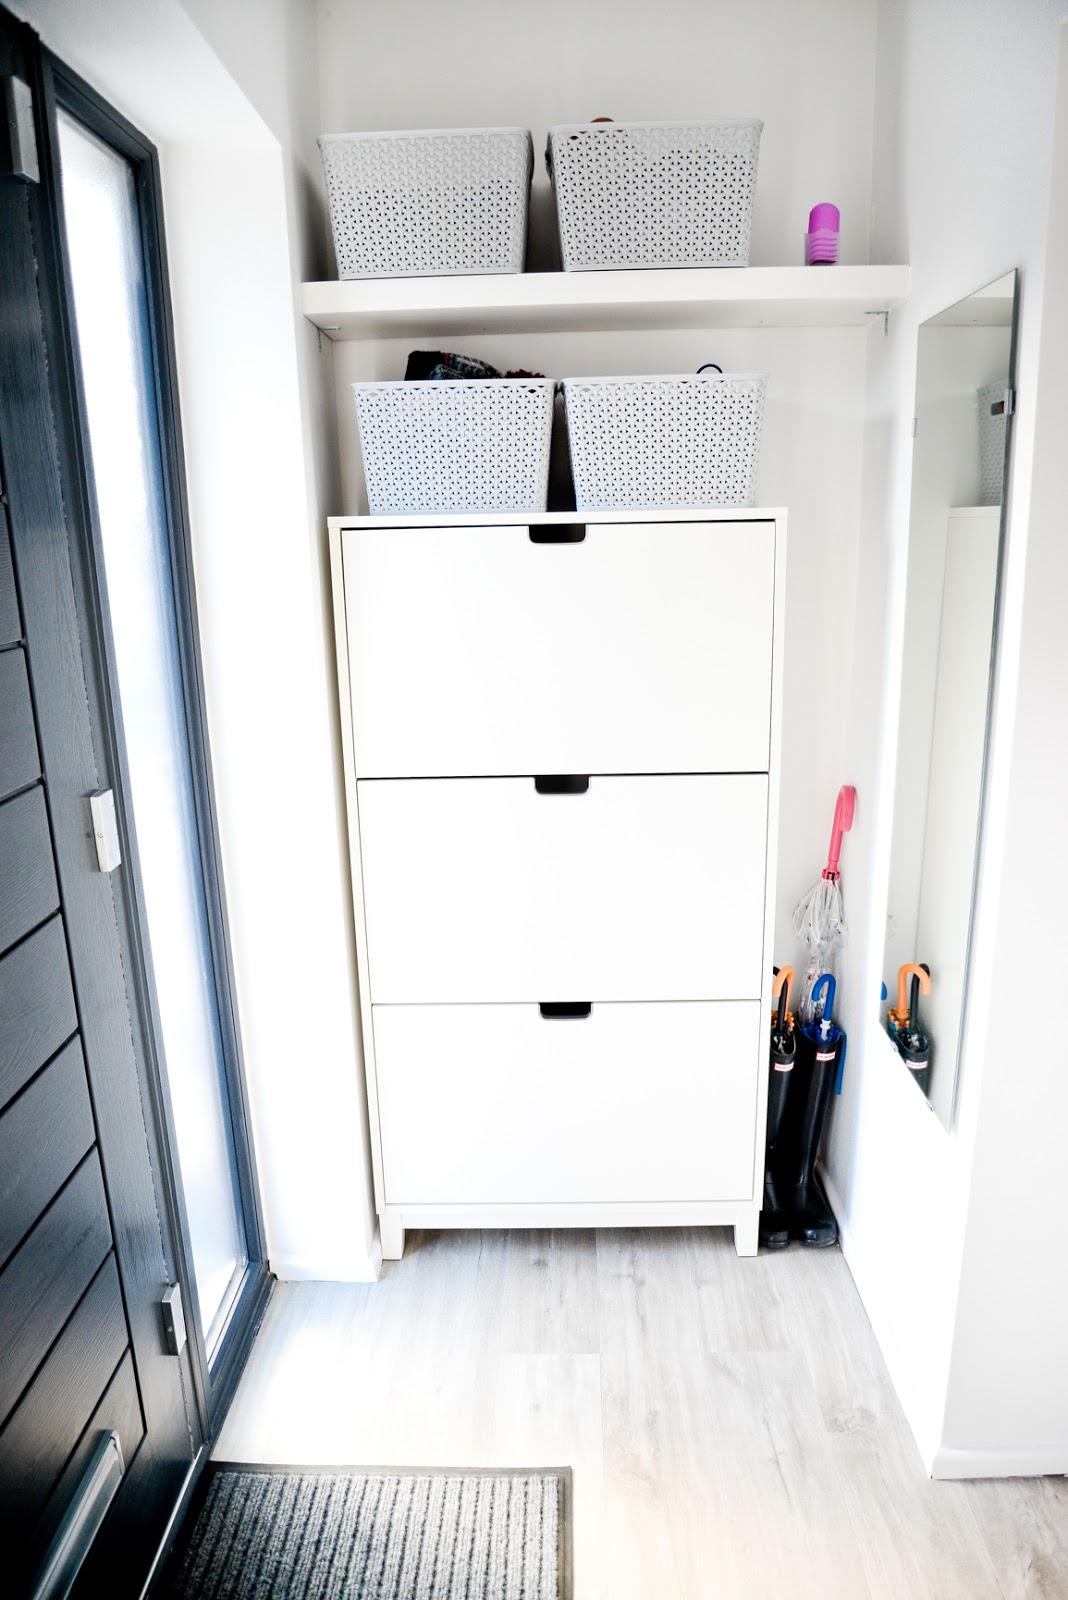 stall ikea shoe cabinet, shoe cabinet, shoe storage, ikea shoe storage, ikea shoe cabinet,